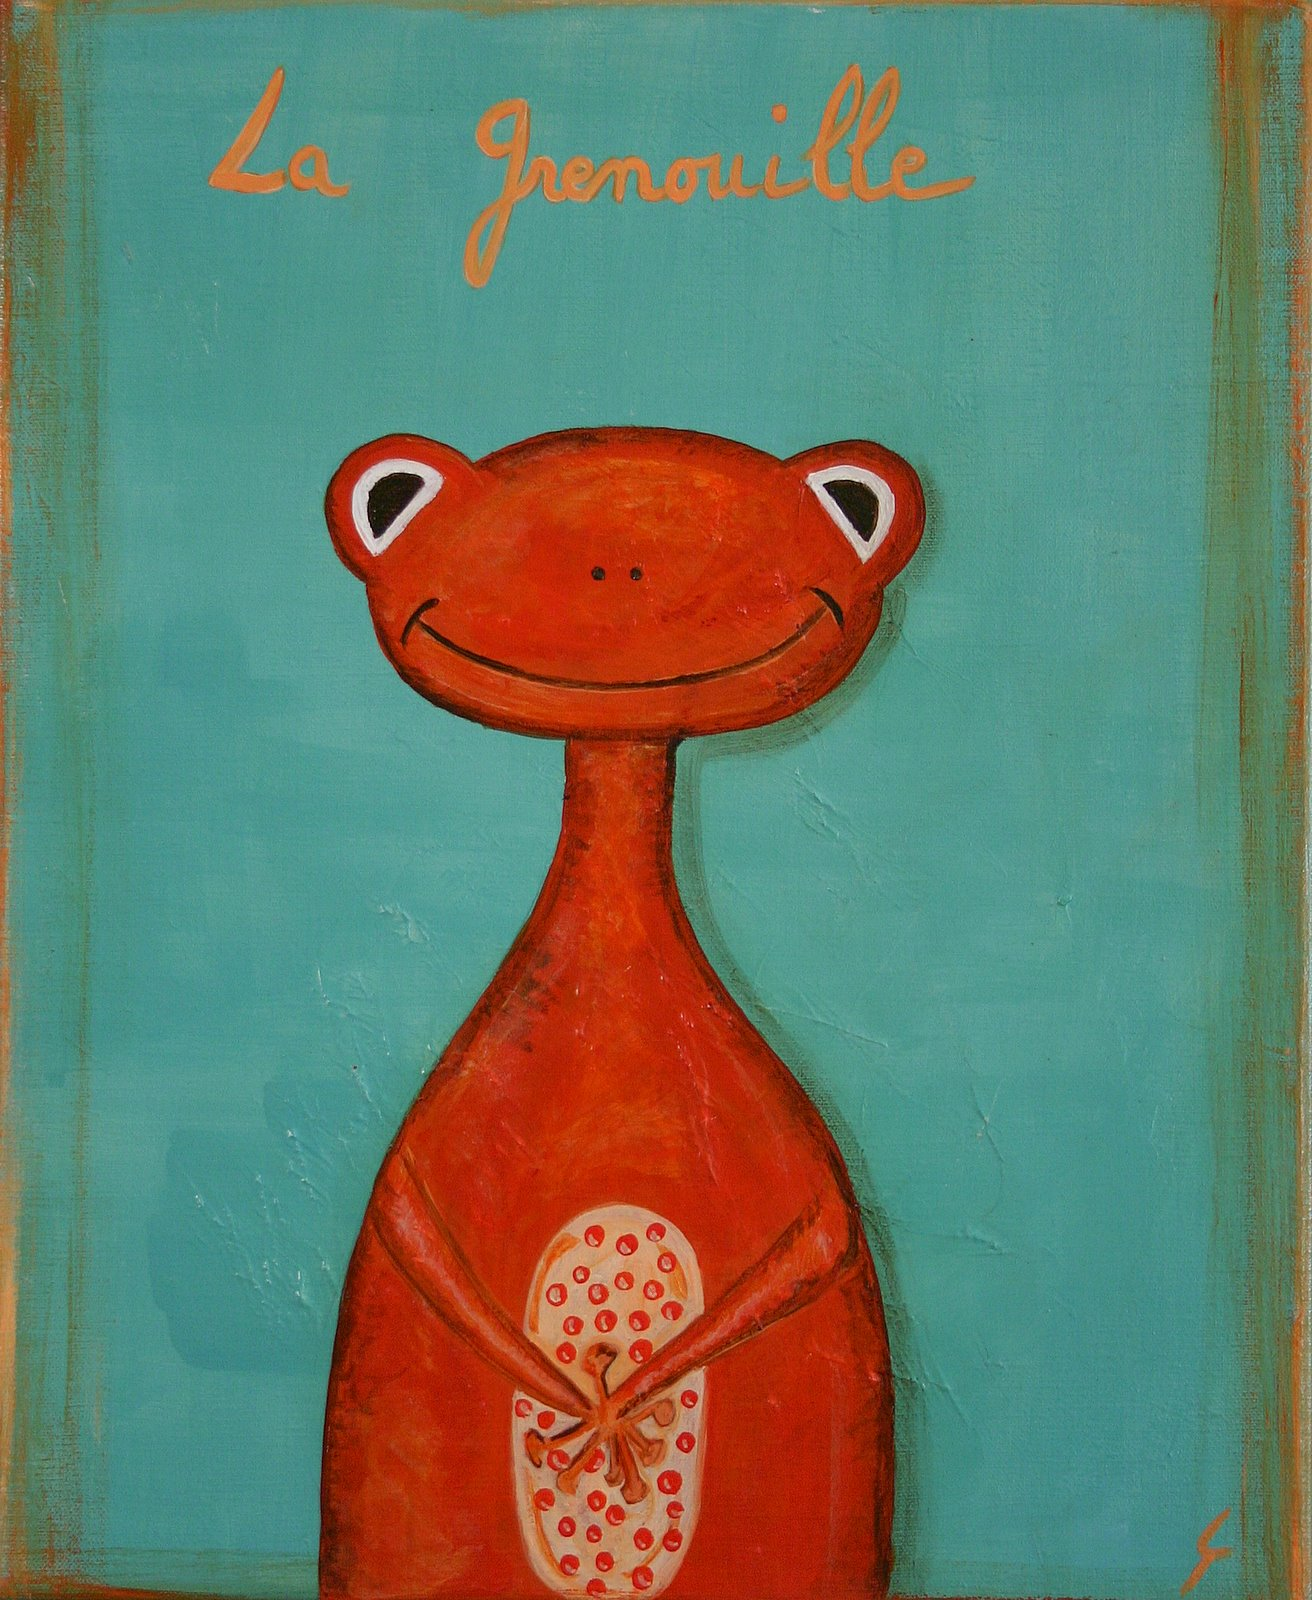 Tableau Contemporain, La grenouille orange. Sophie Costa, artiste peintre.